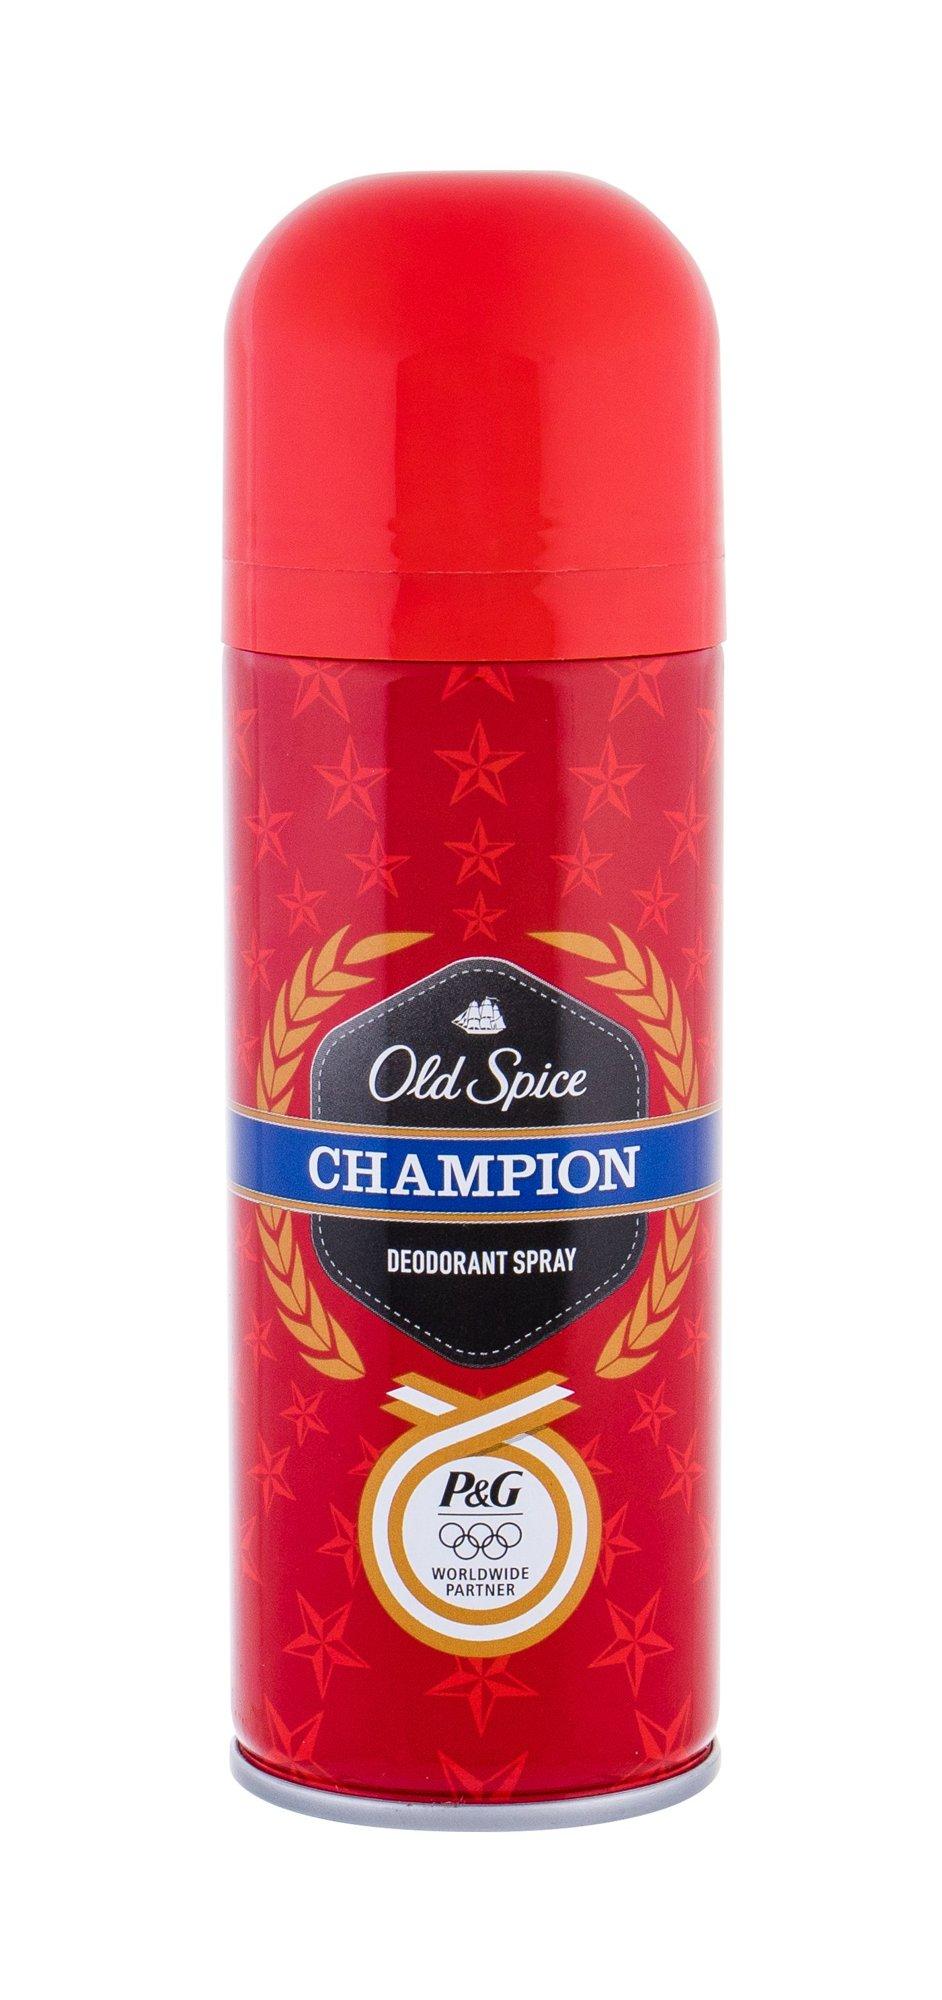 Old Spice Champion Deodorant 150ml